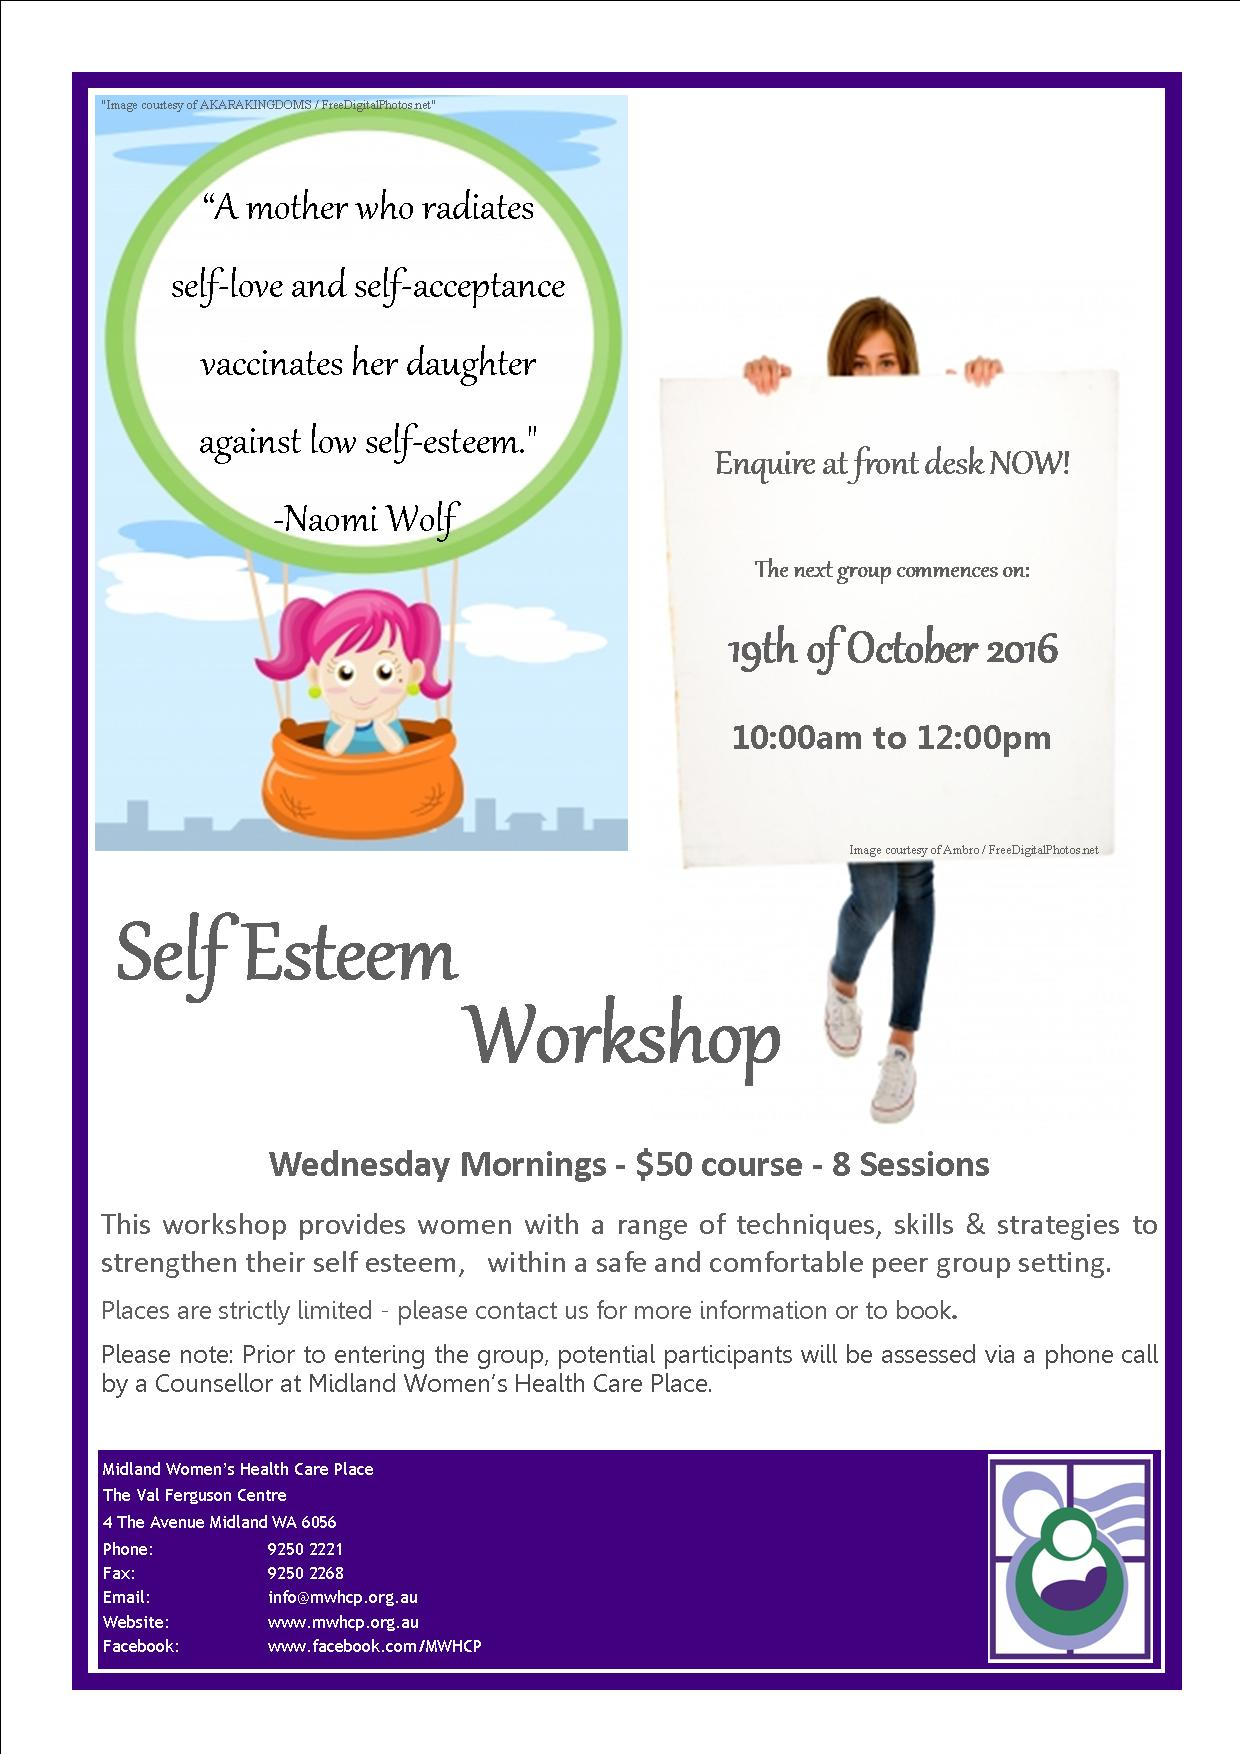 whp-self-esteem-workshop-flyer-midland-2016-term-4